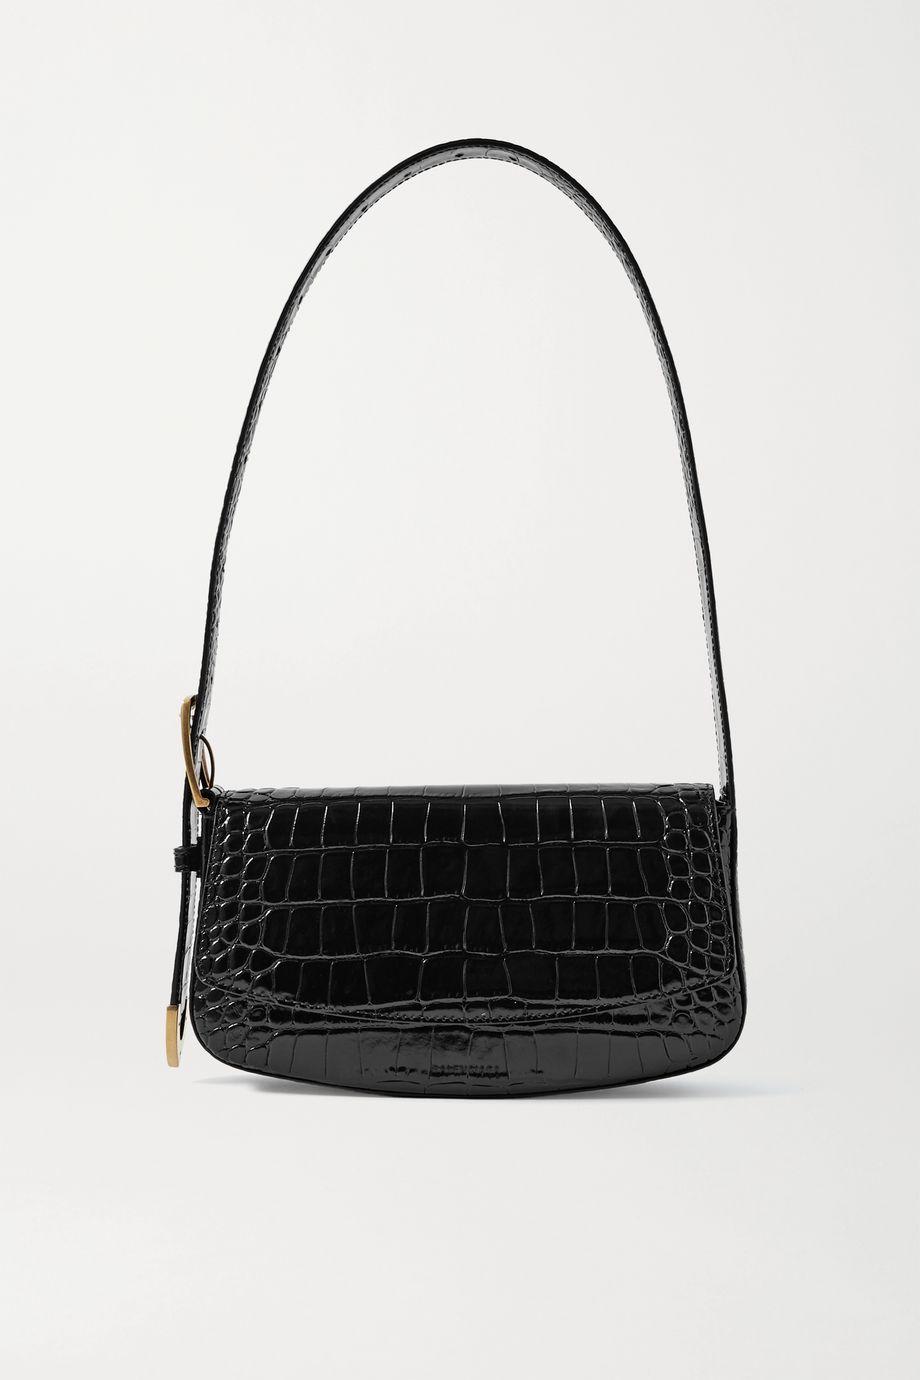 Balenciaga Ghost croc-effect leather shoulder bag